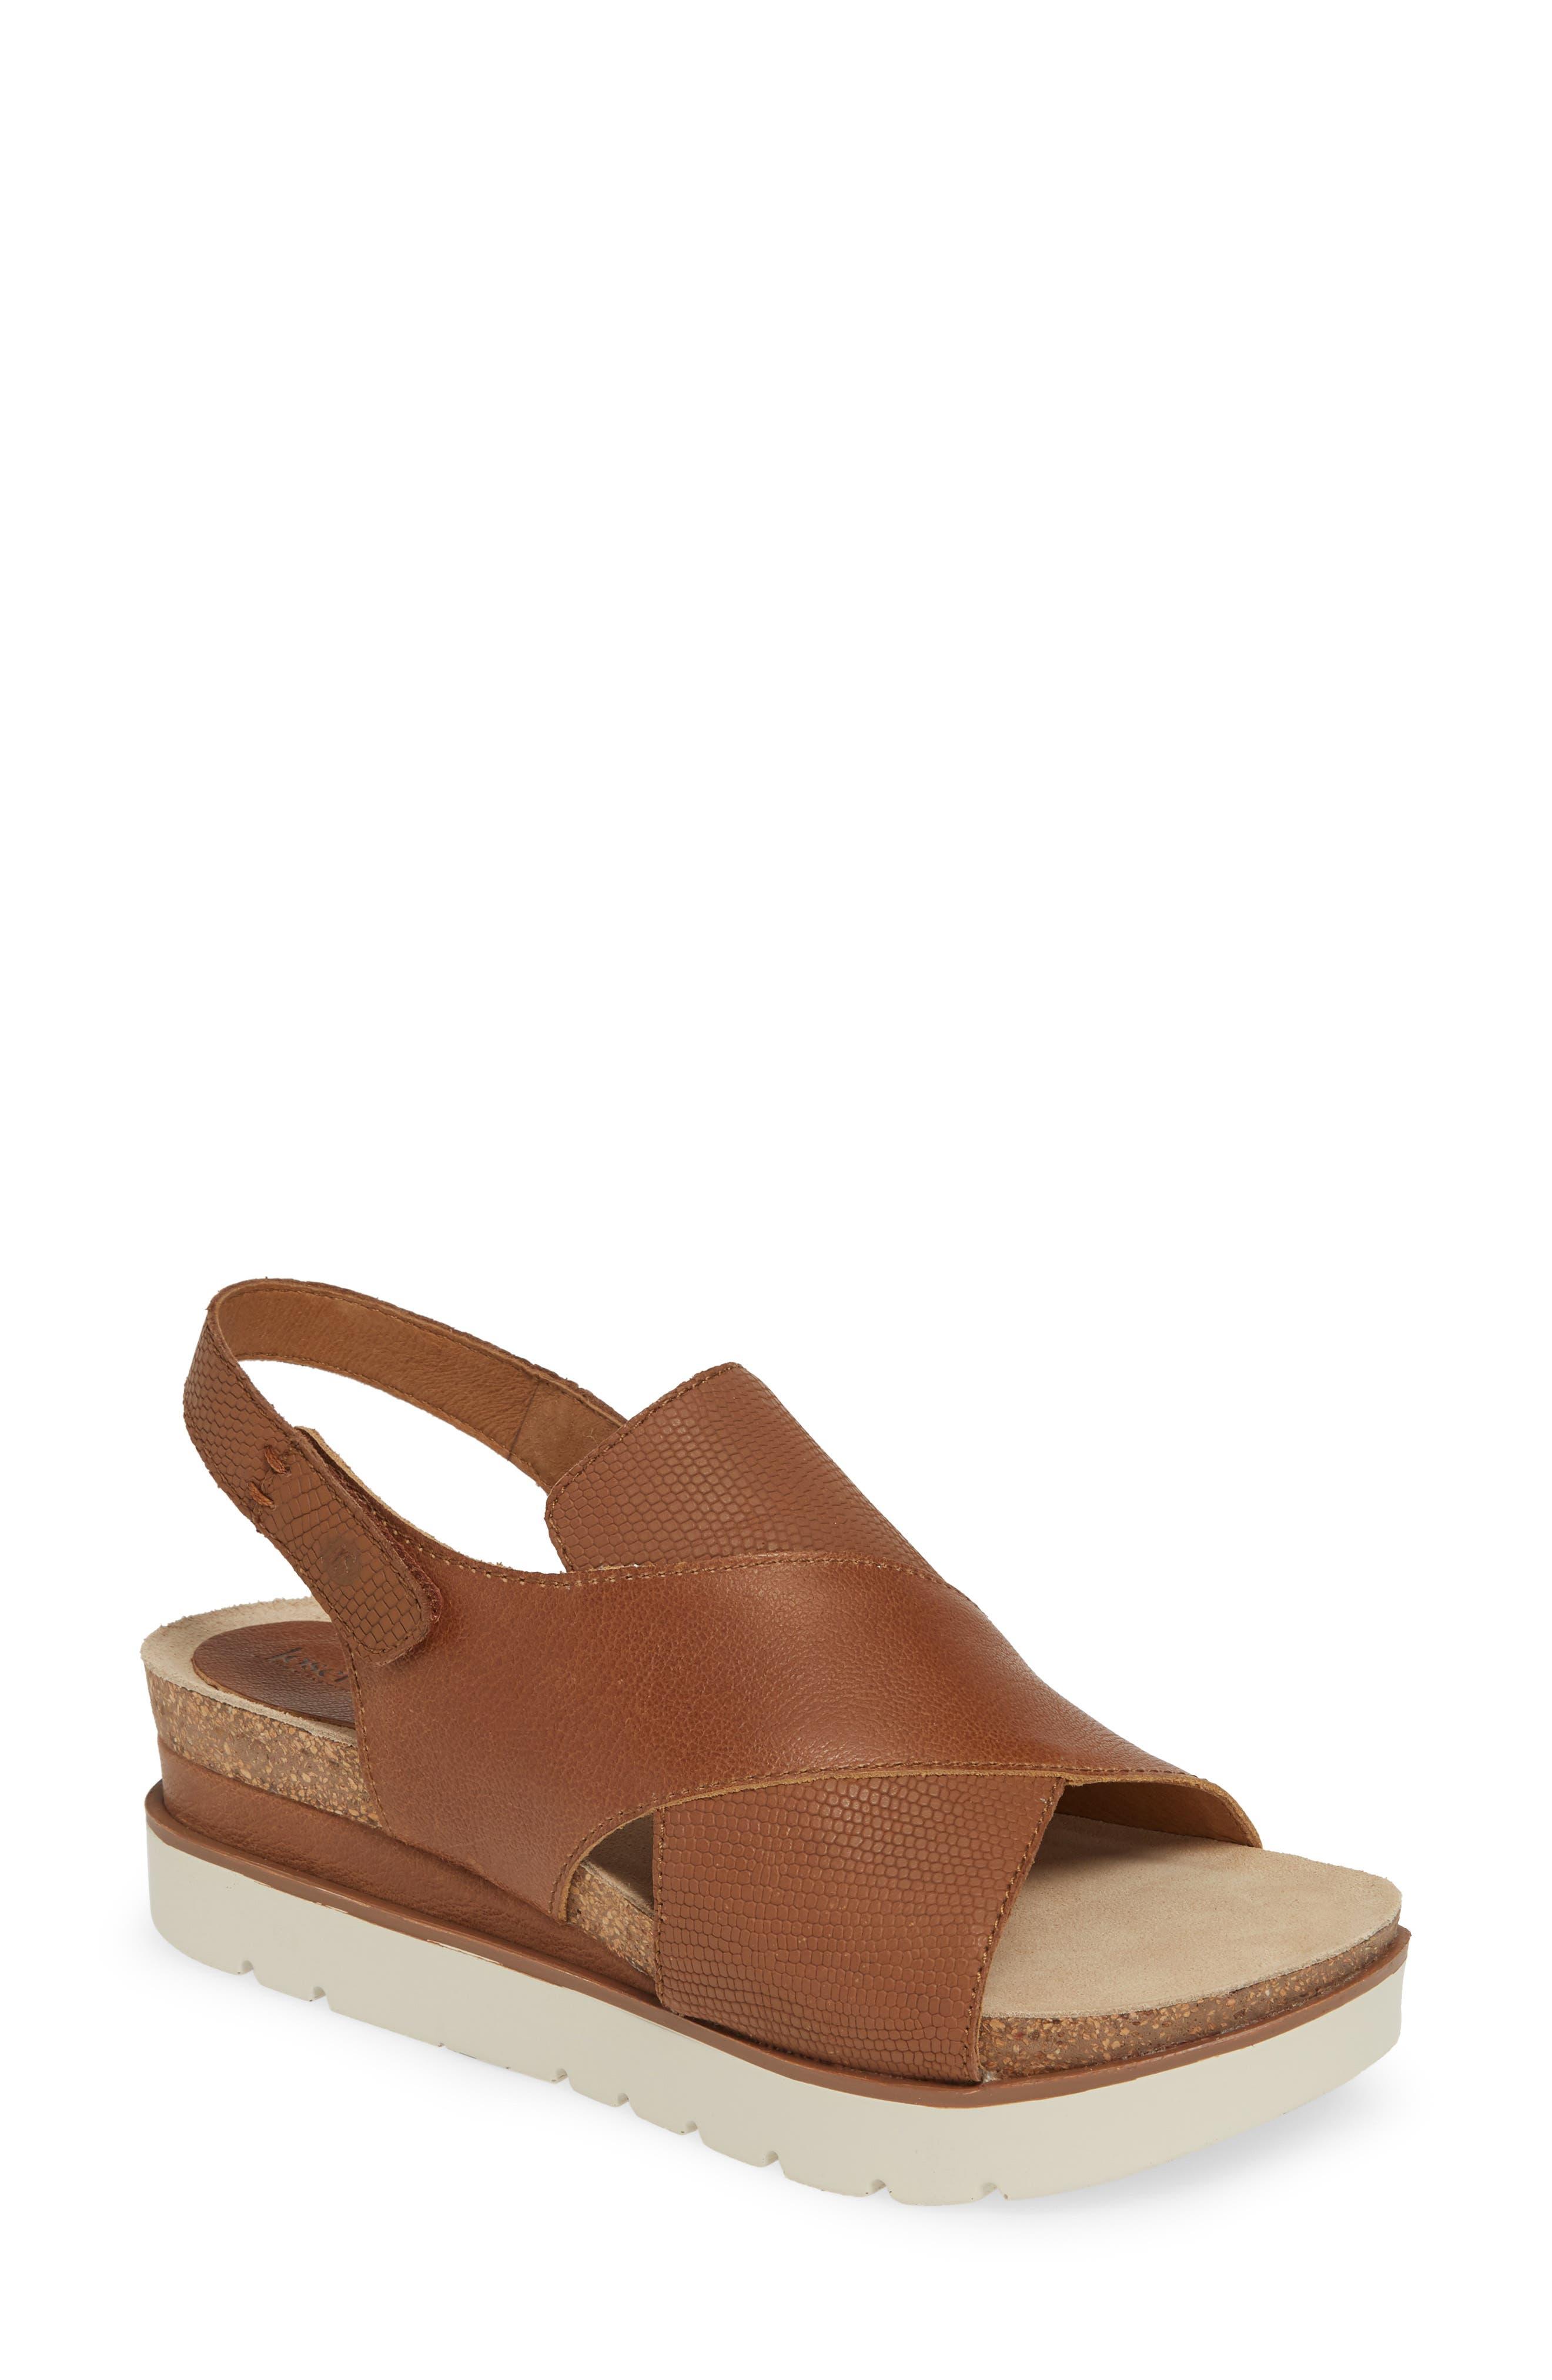 Clea 05 Sandal